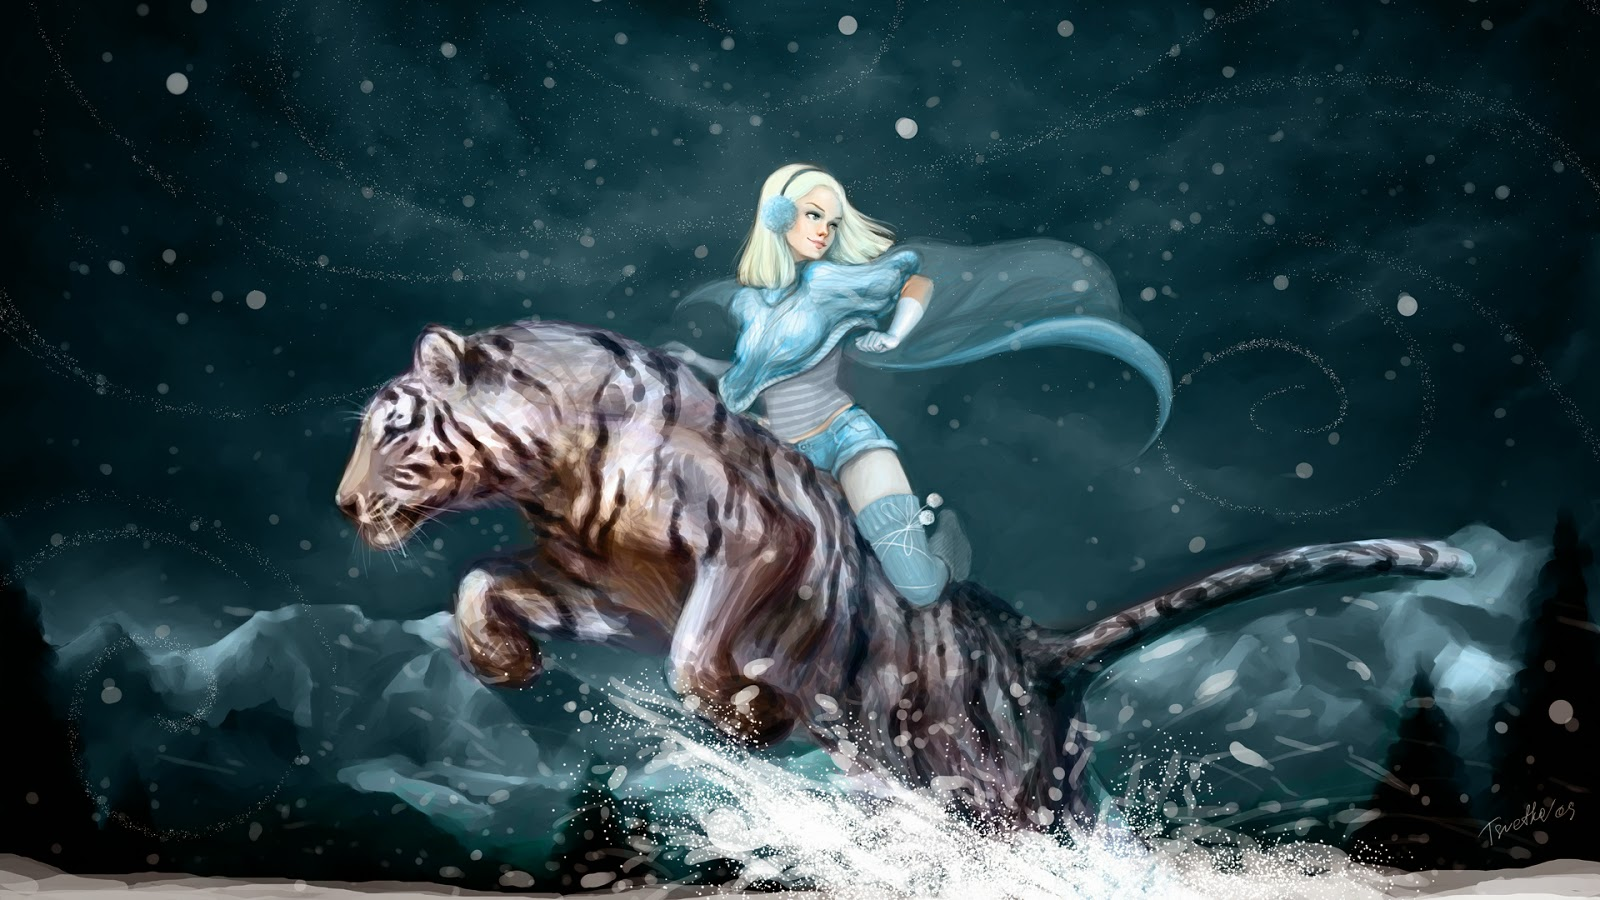 Photo Collection Fantasy Girl Tiger Hd